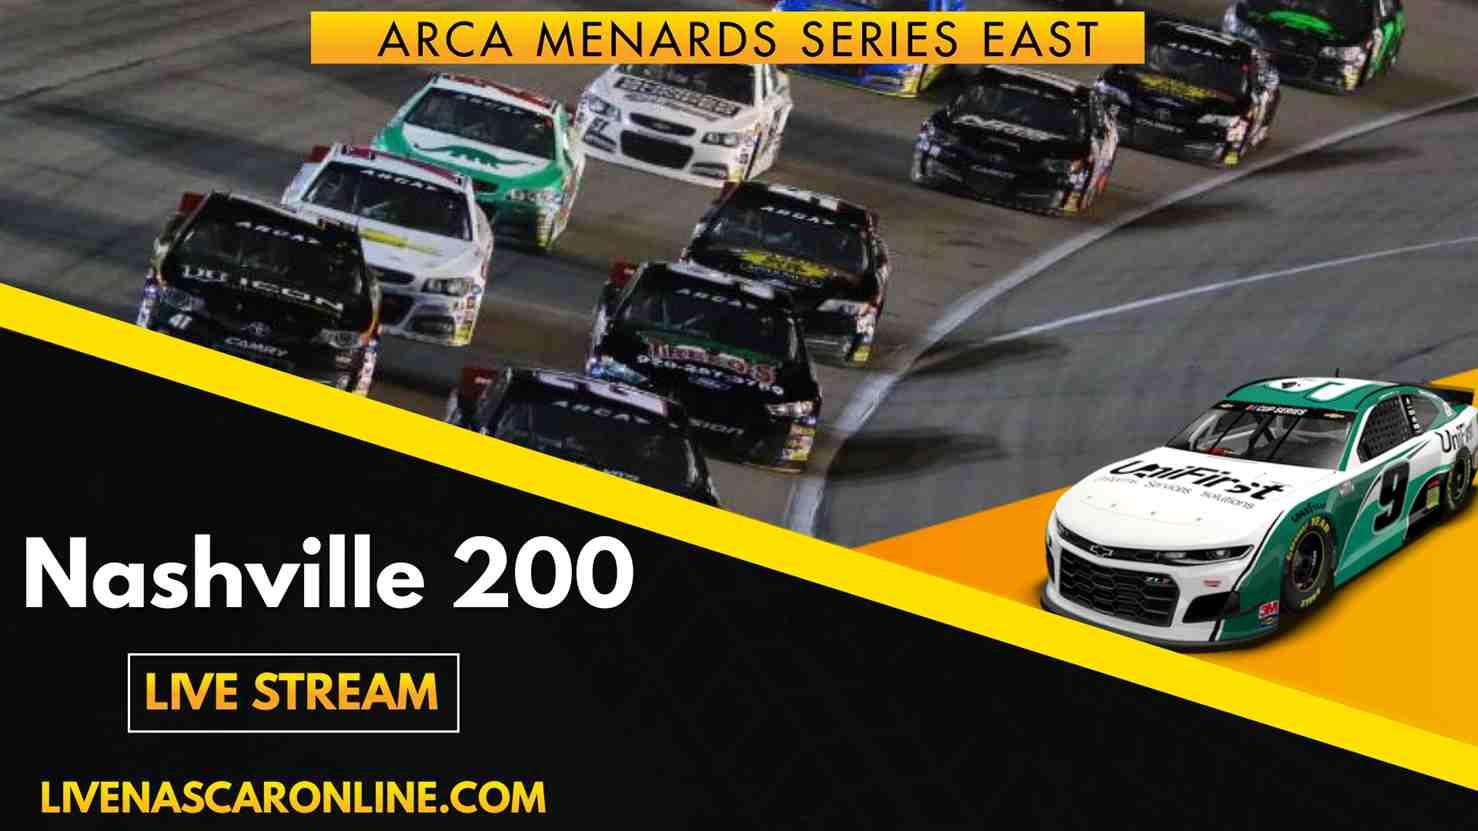 ARCA Nashville 200 Live Stream 2021